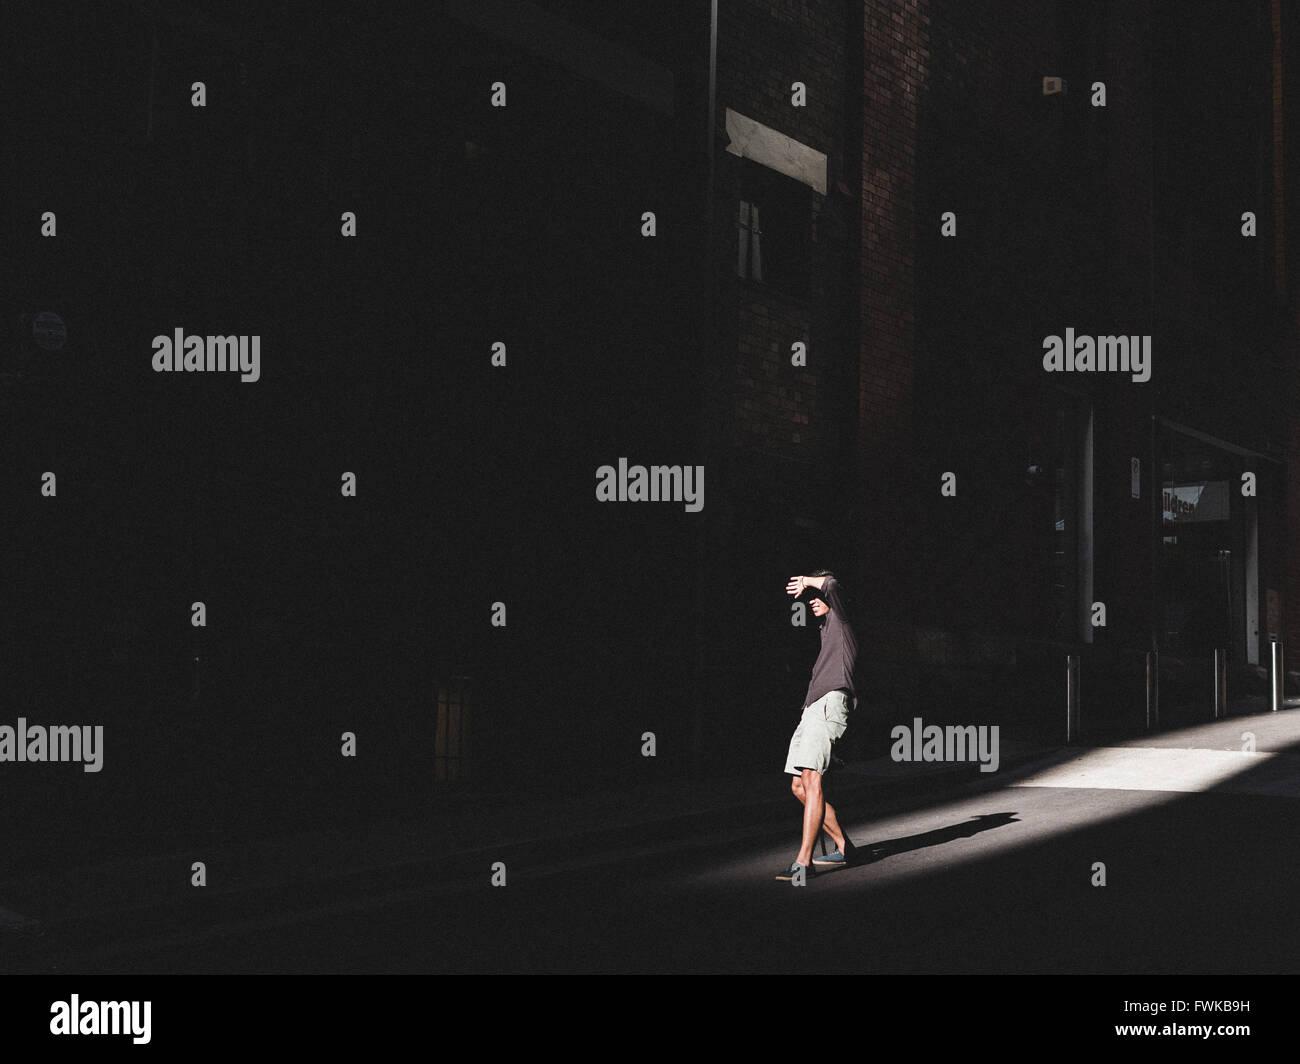 Full Length Of Man Standing On Street Against Building - Stock Image